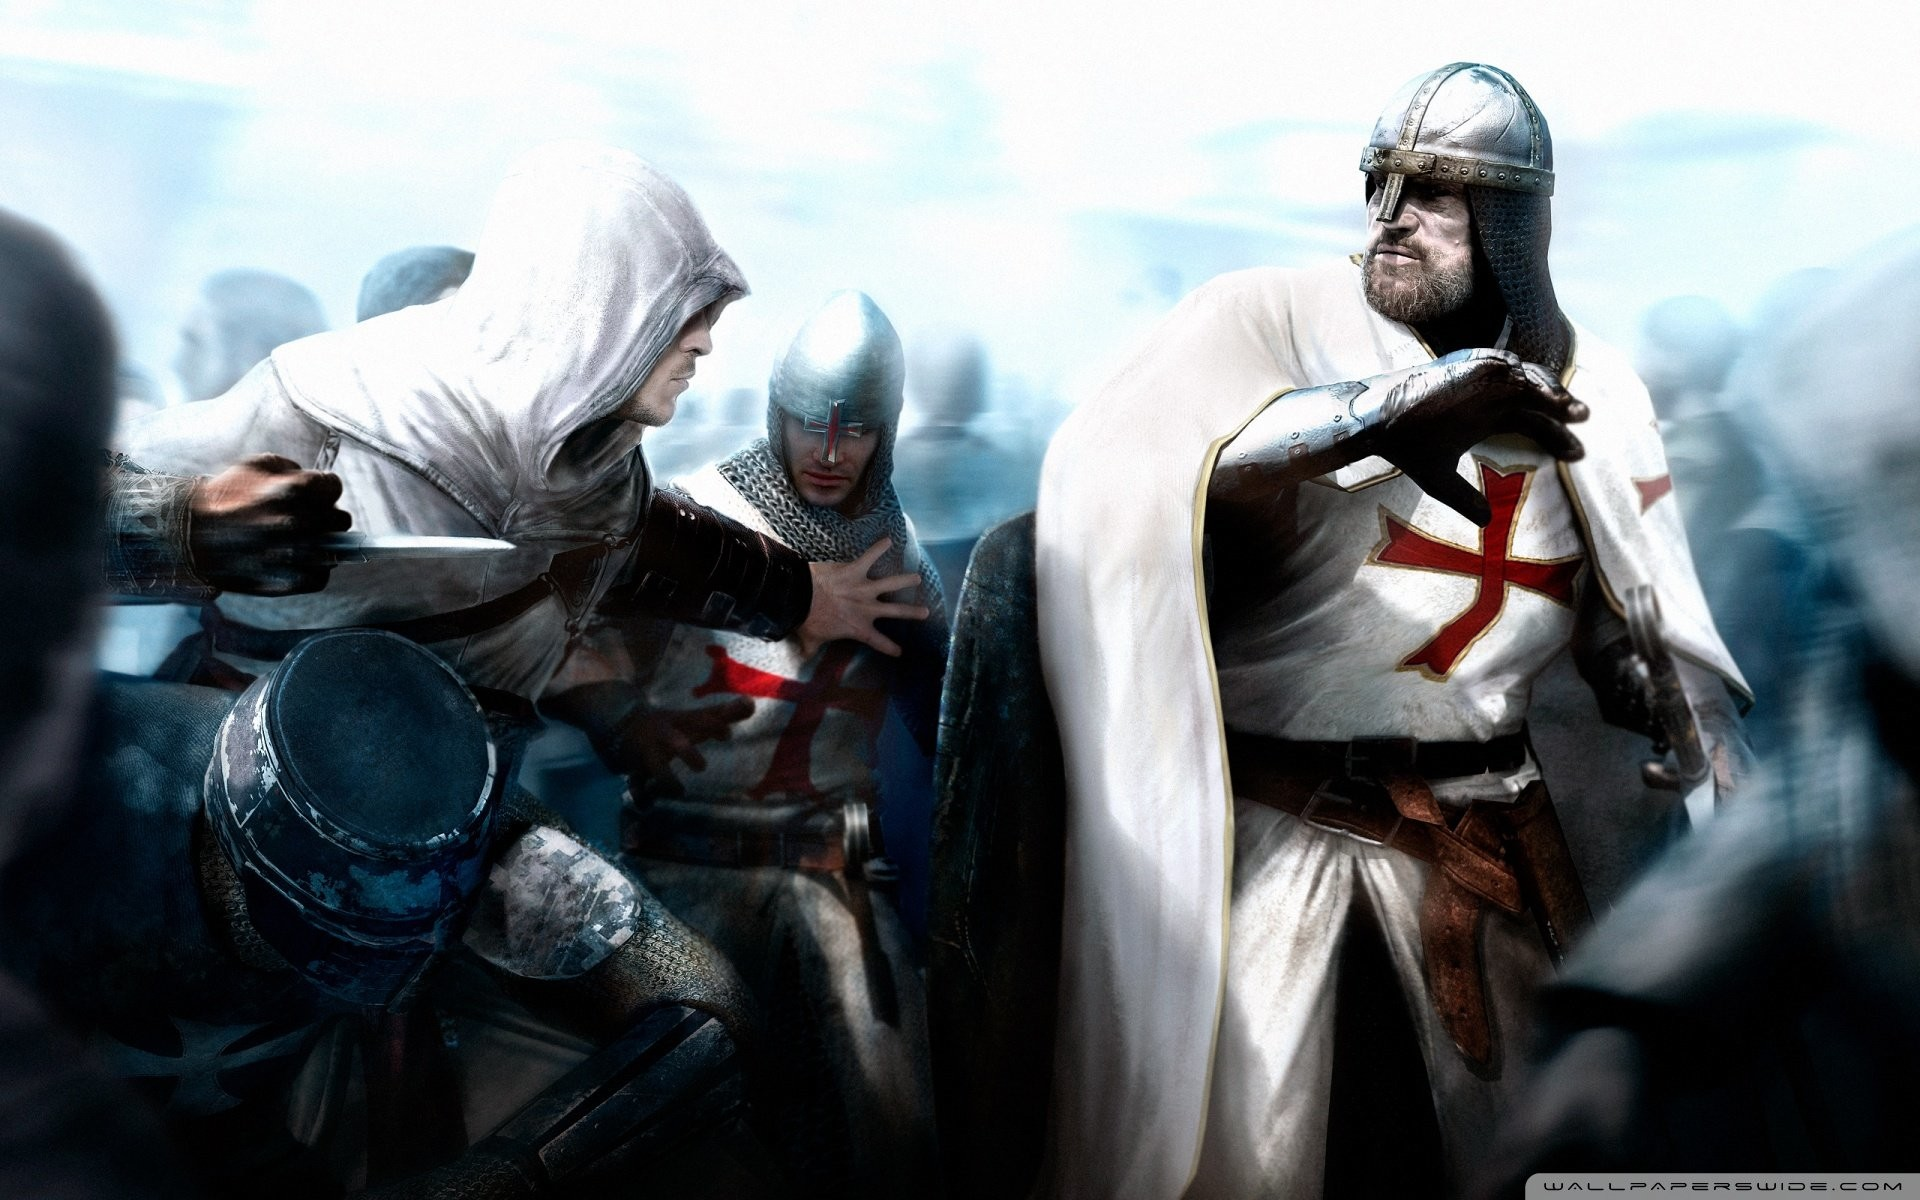 Res: 1920x1200, knights templar